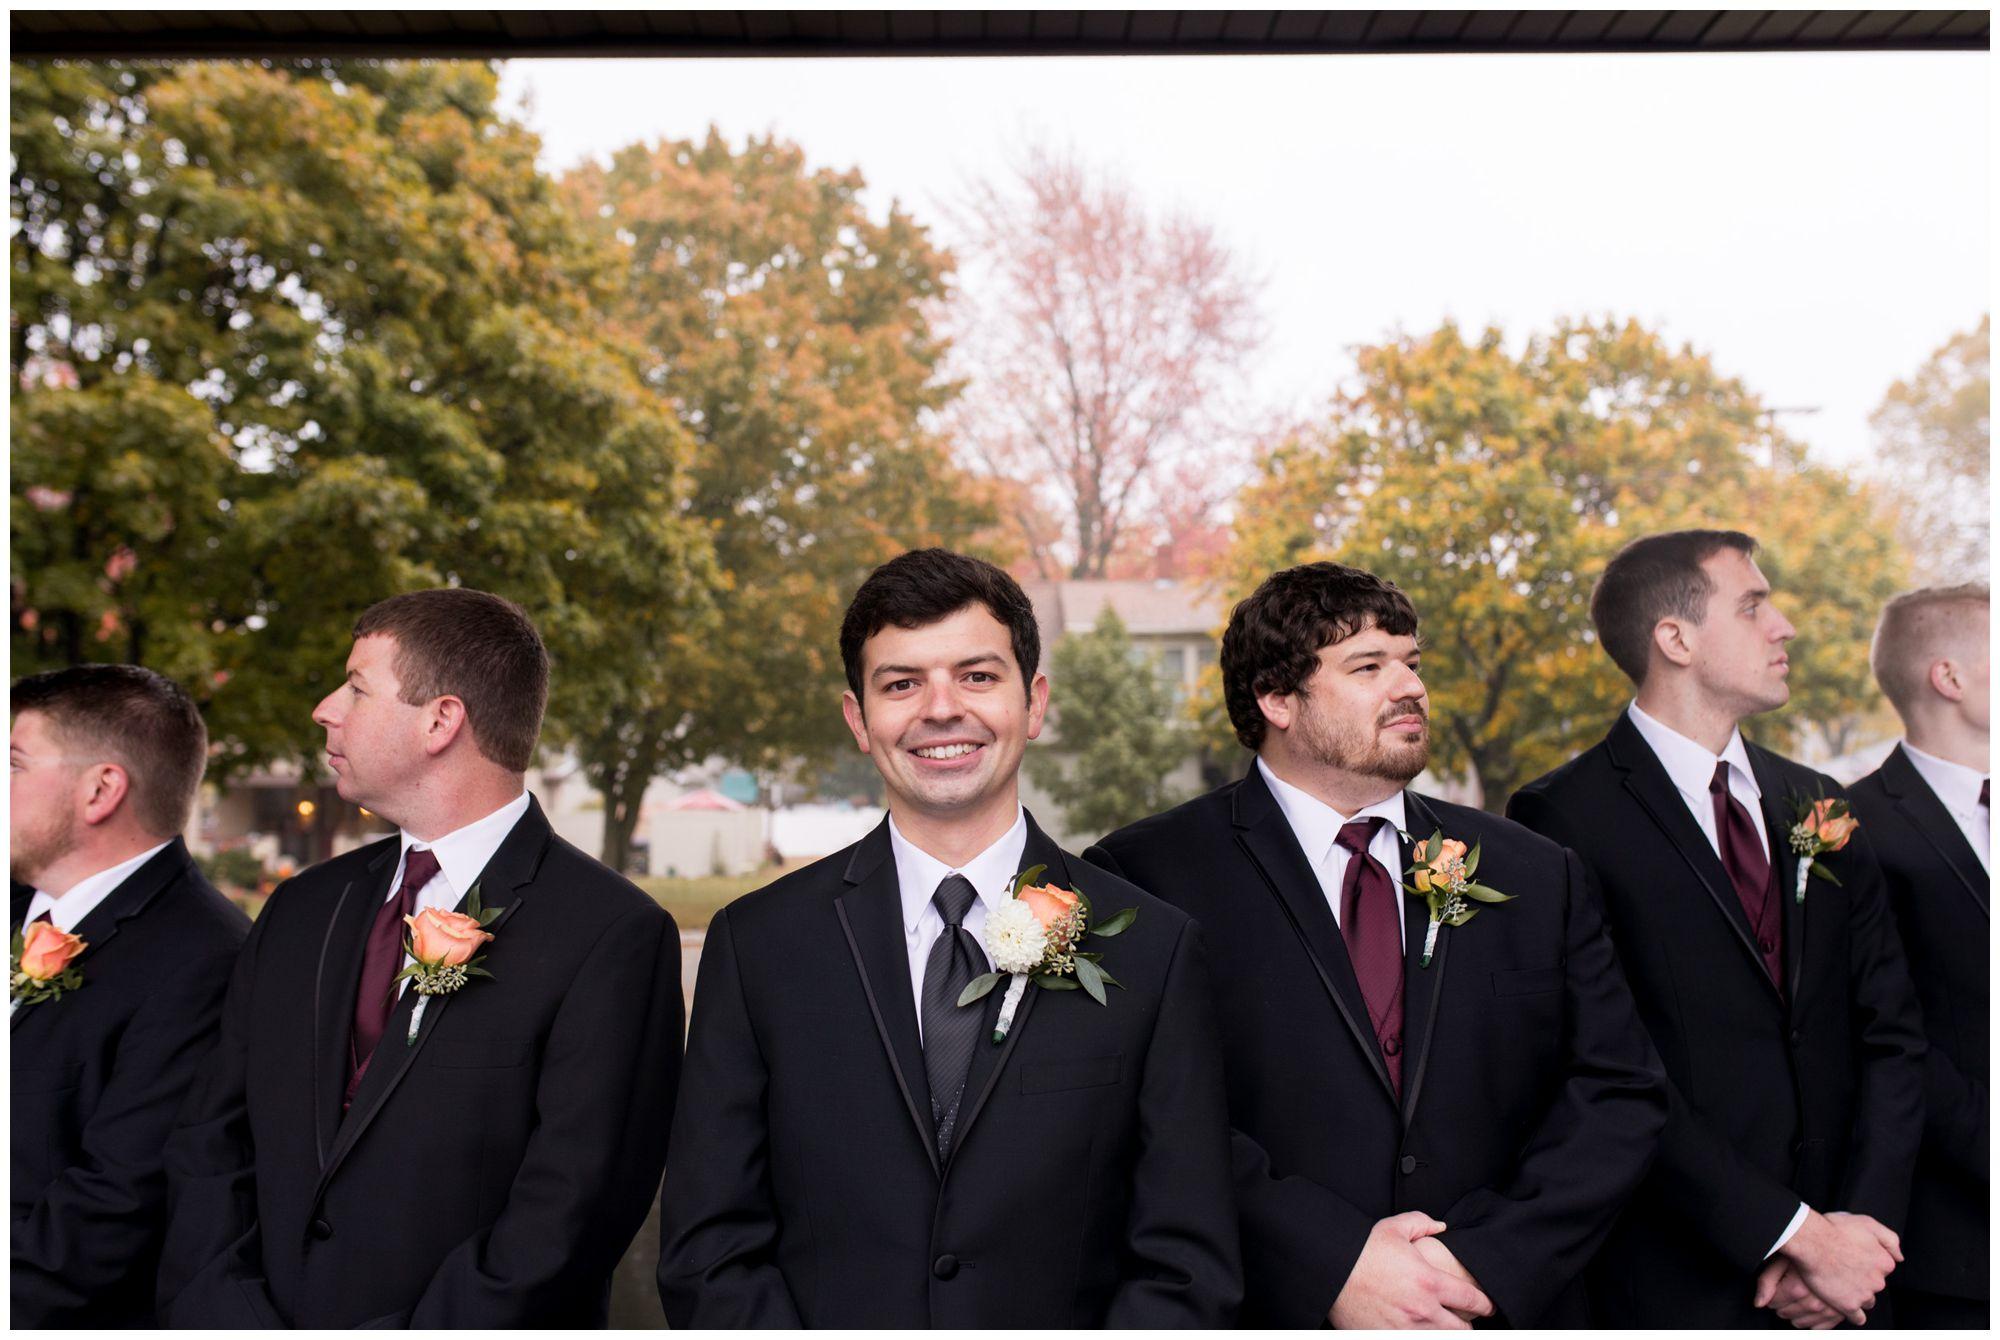 groom with groomsmen before wedding ceremony in Decatur Indiana